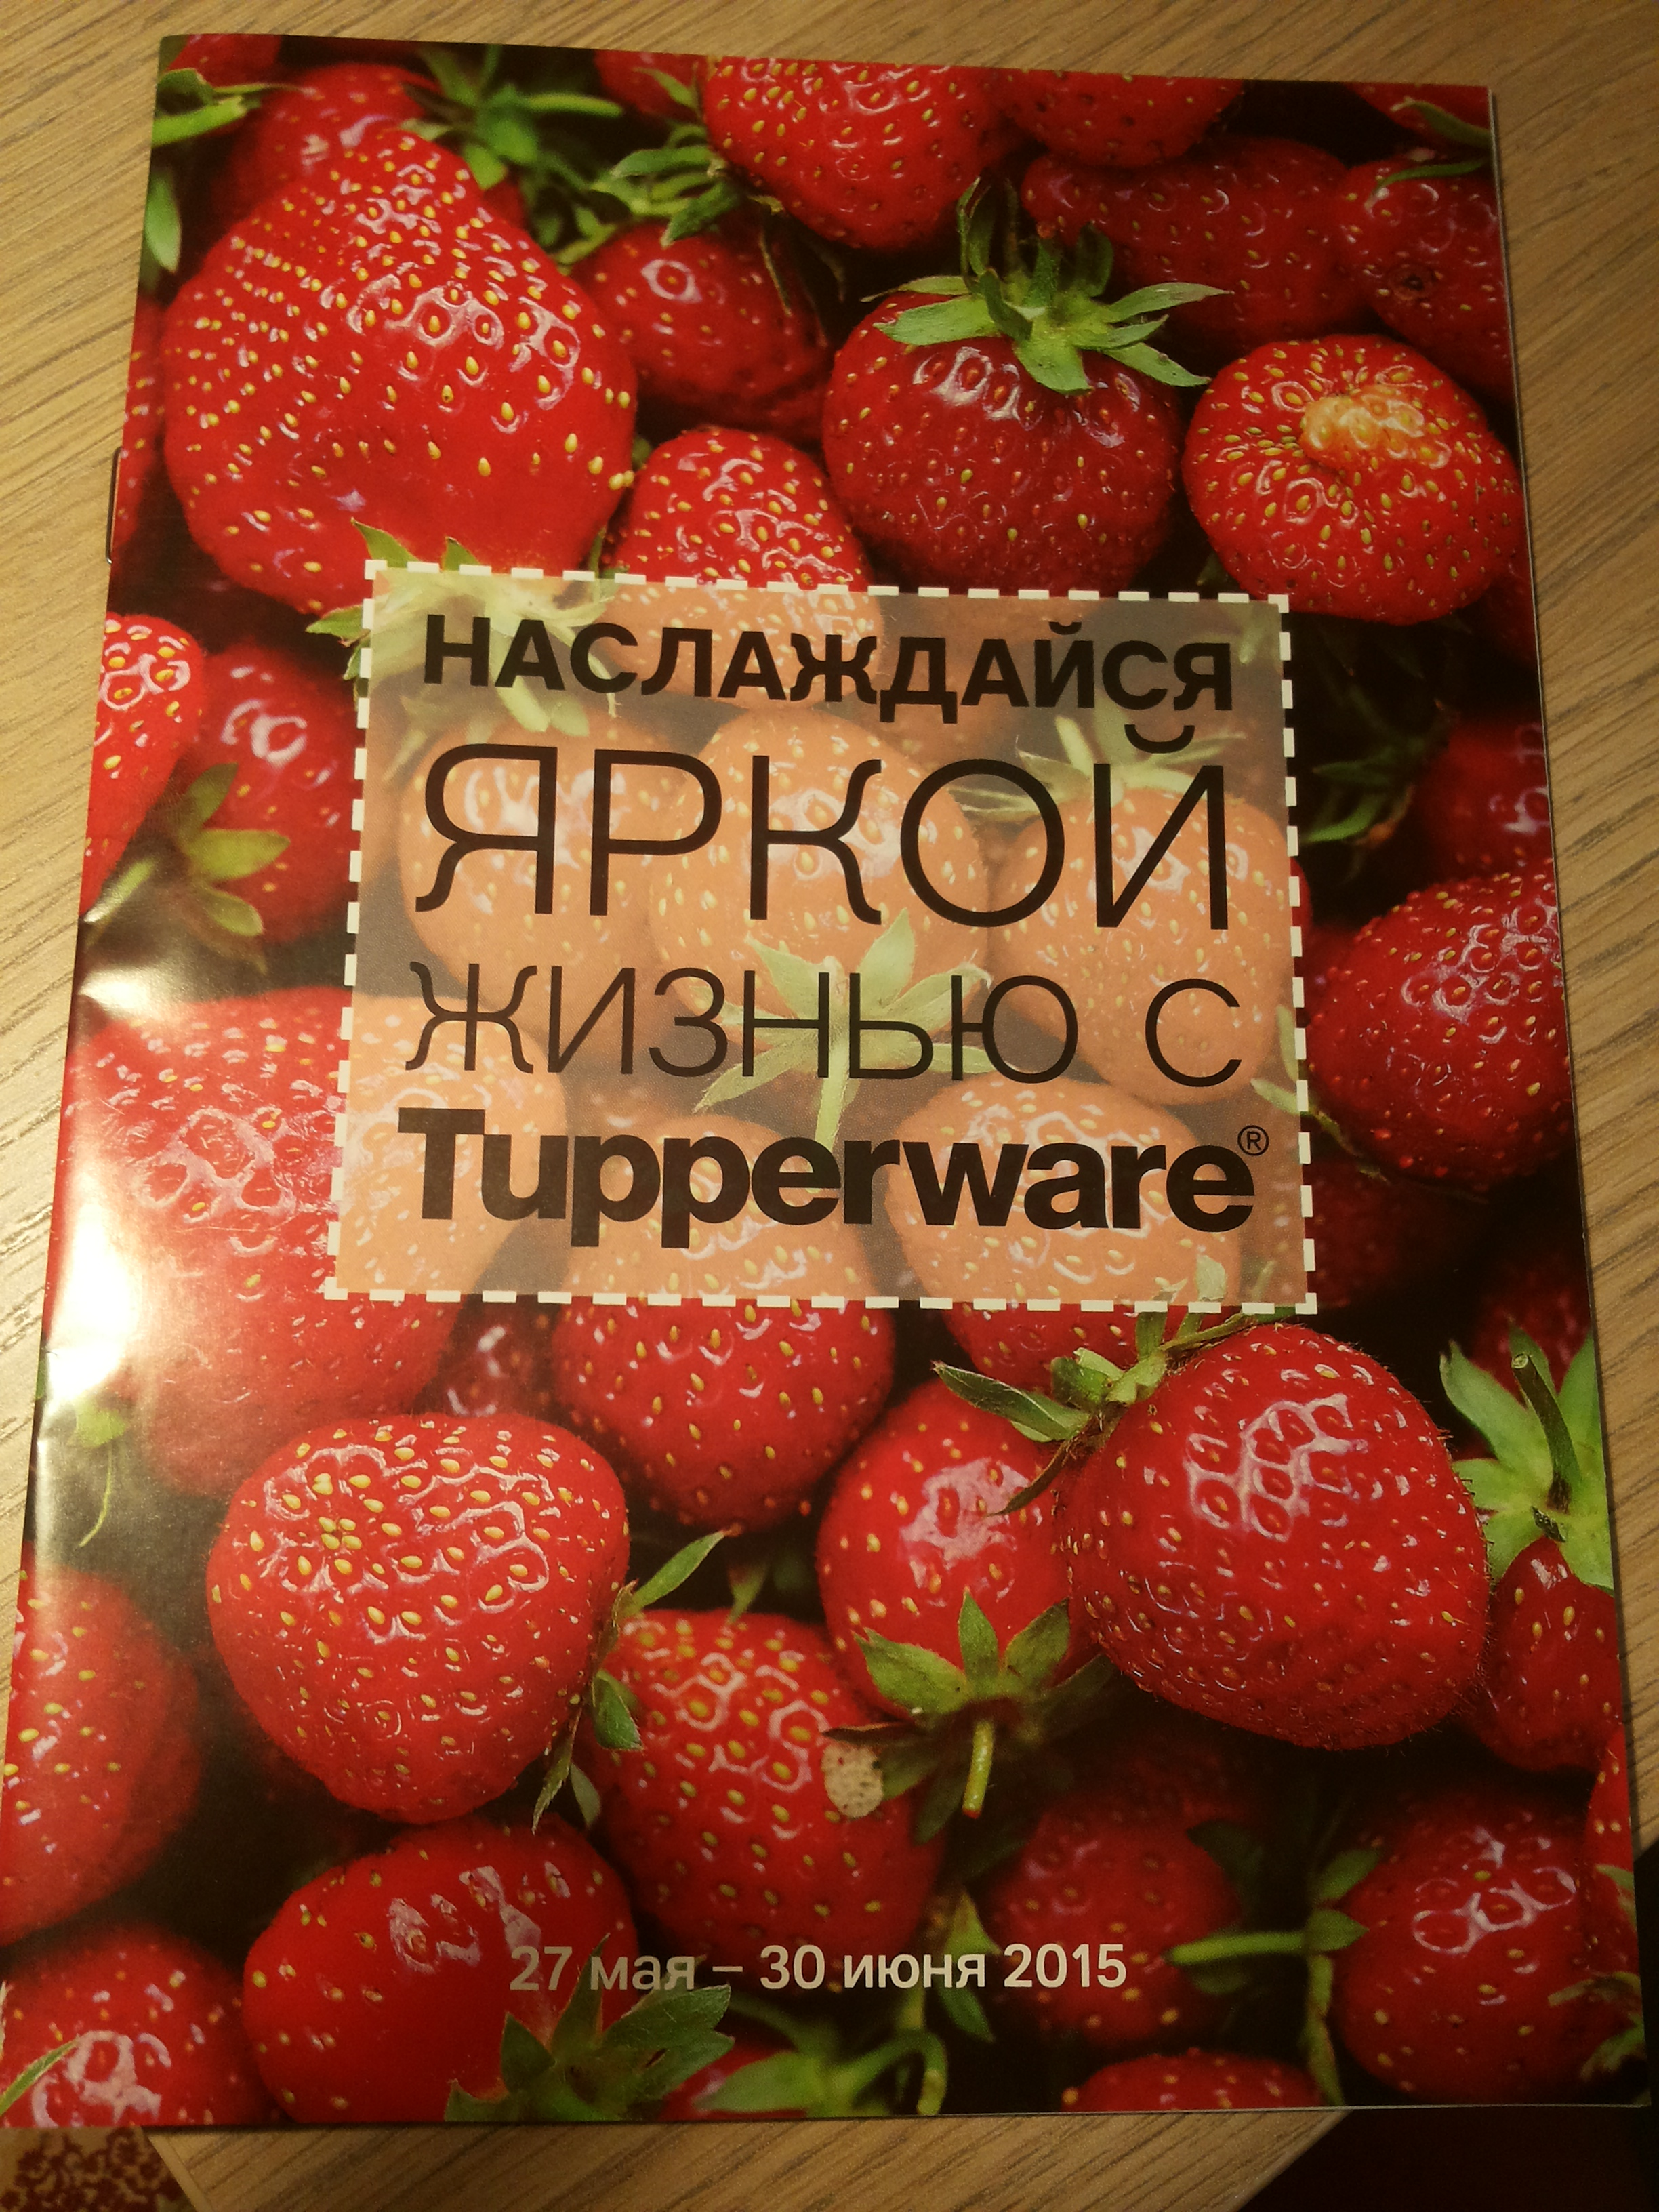 Tupperware, второе спец.предложение!!!!